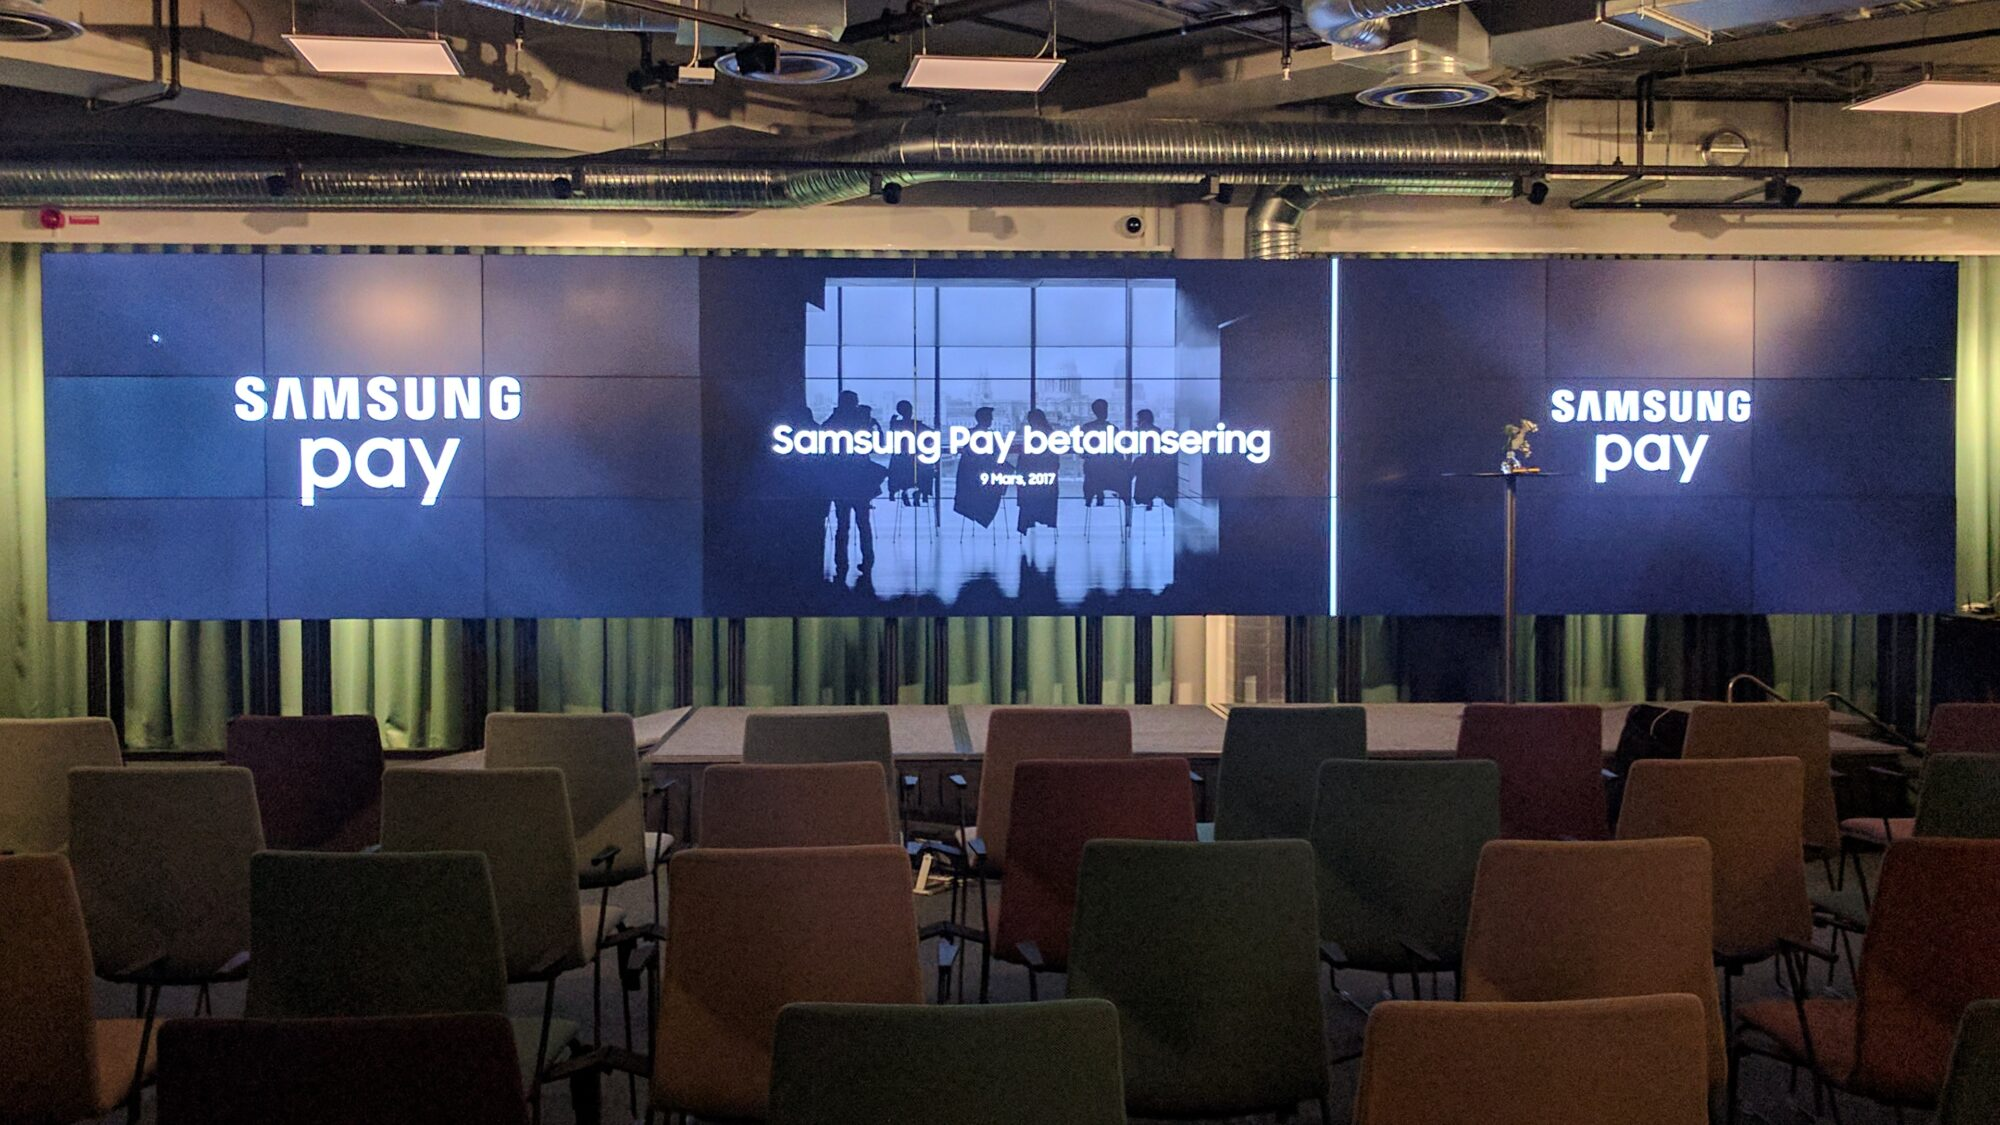 Lanseringen idag av Samsung Pay i Sverige